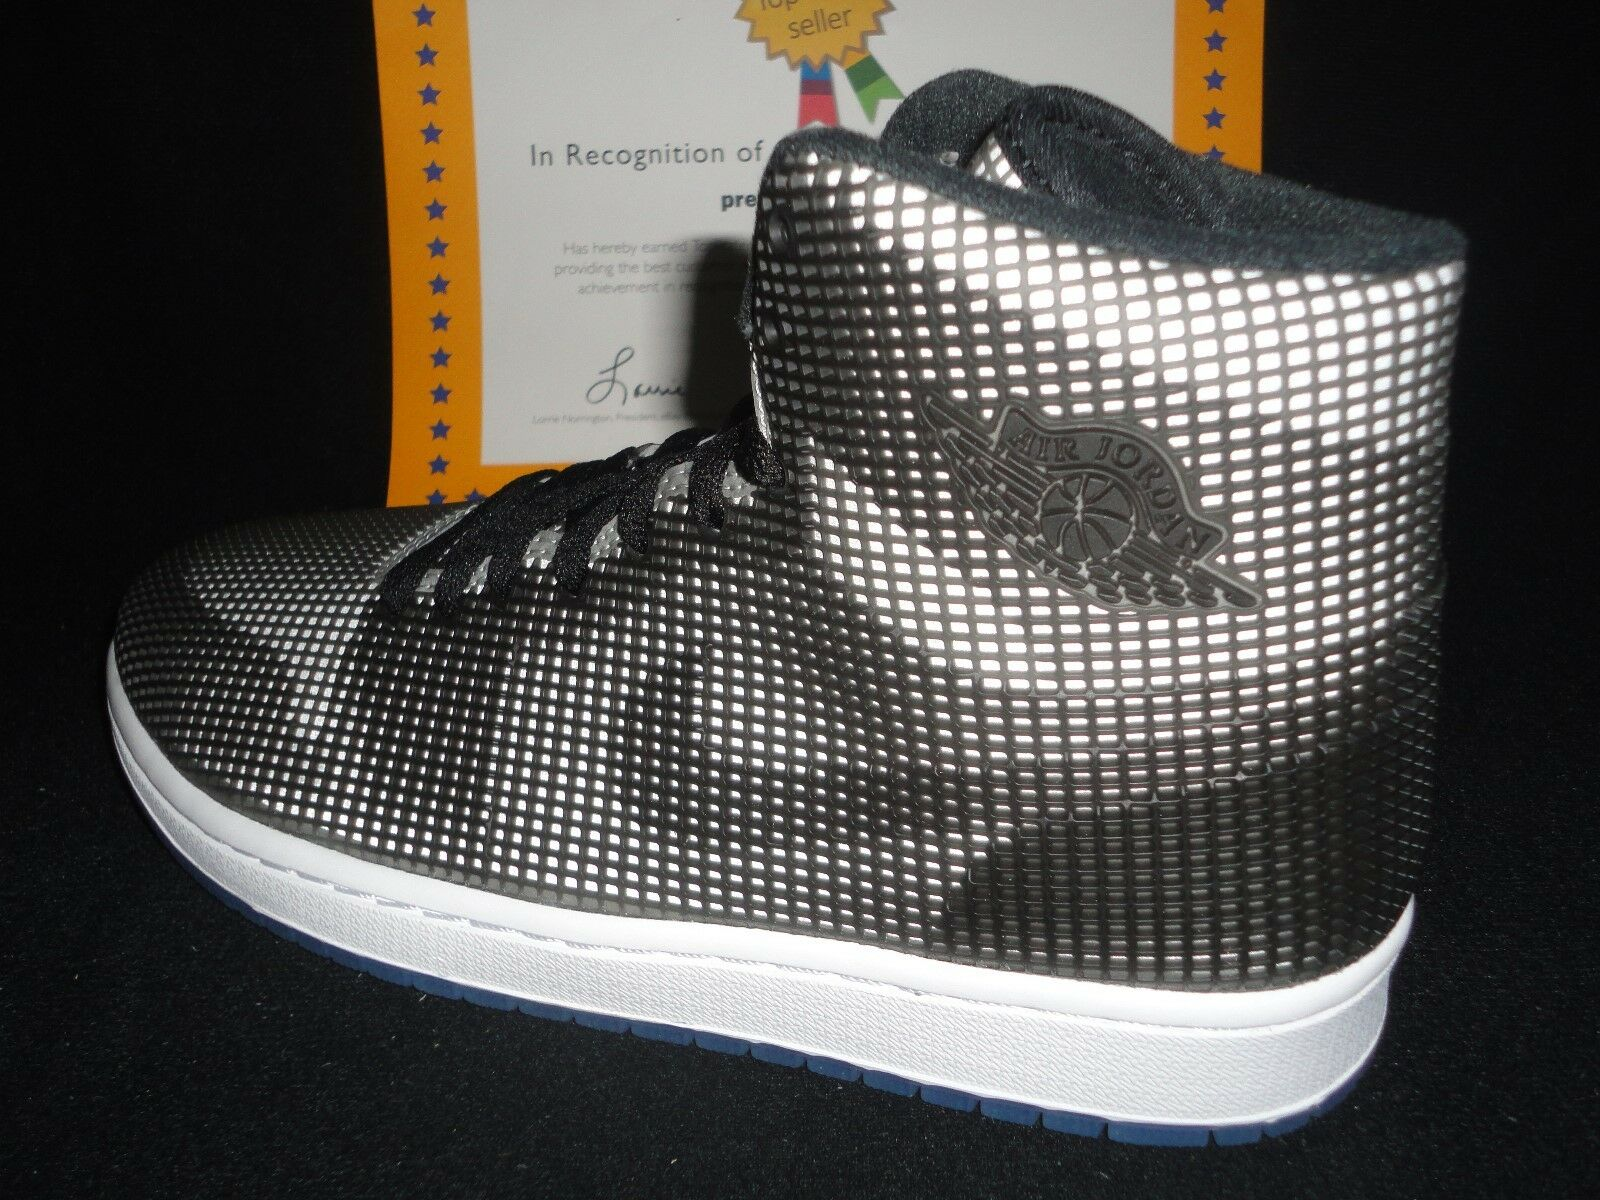 Nike air jordan 4lab1, nero / riflettente siver, dimensioni